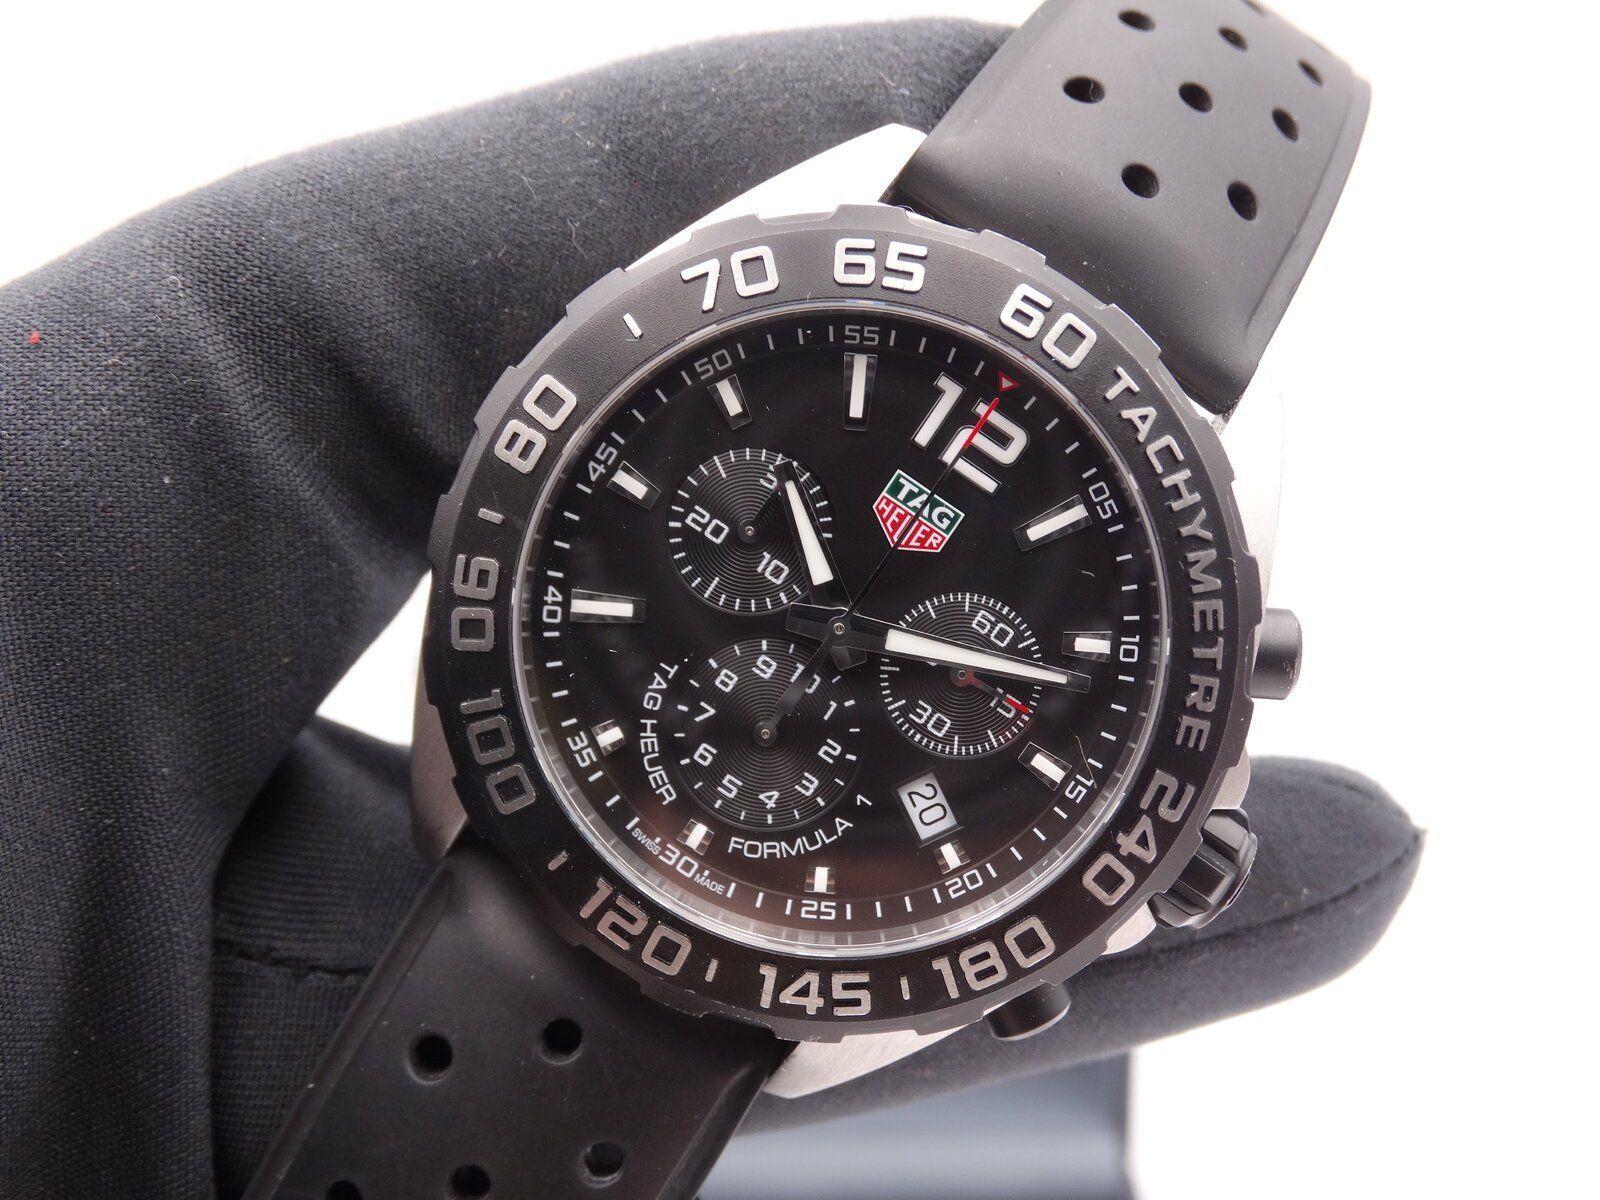 Tag Heuer Formula 1 Chronograph 01334.JPG